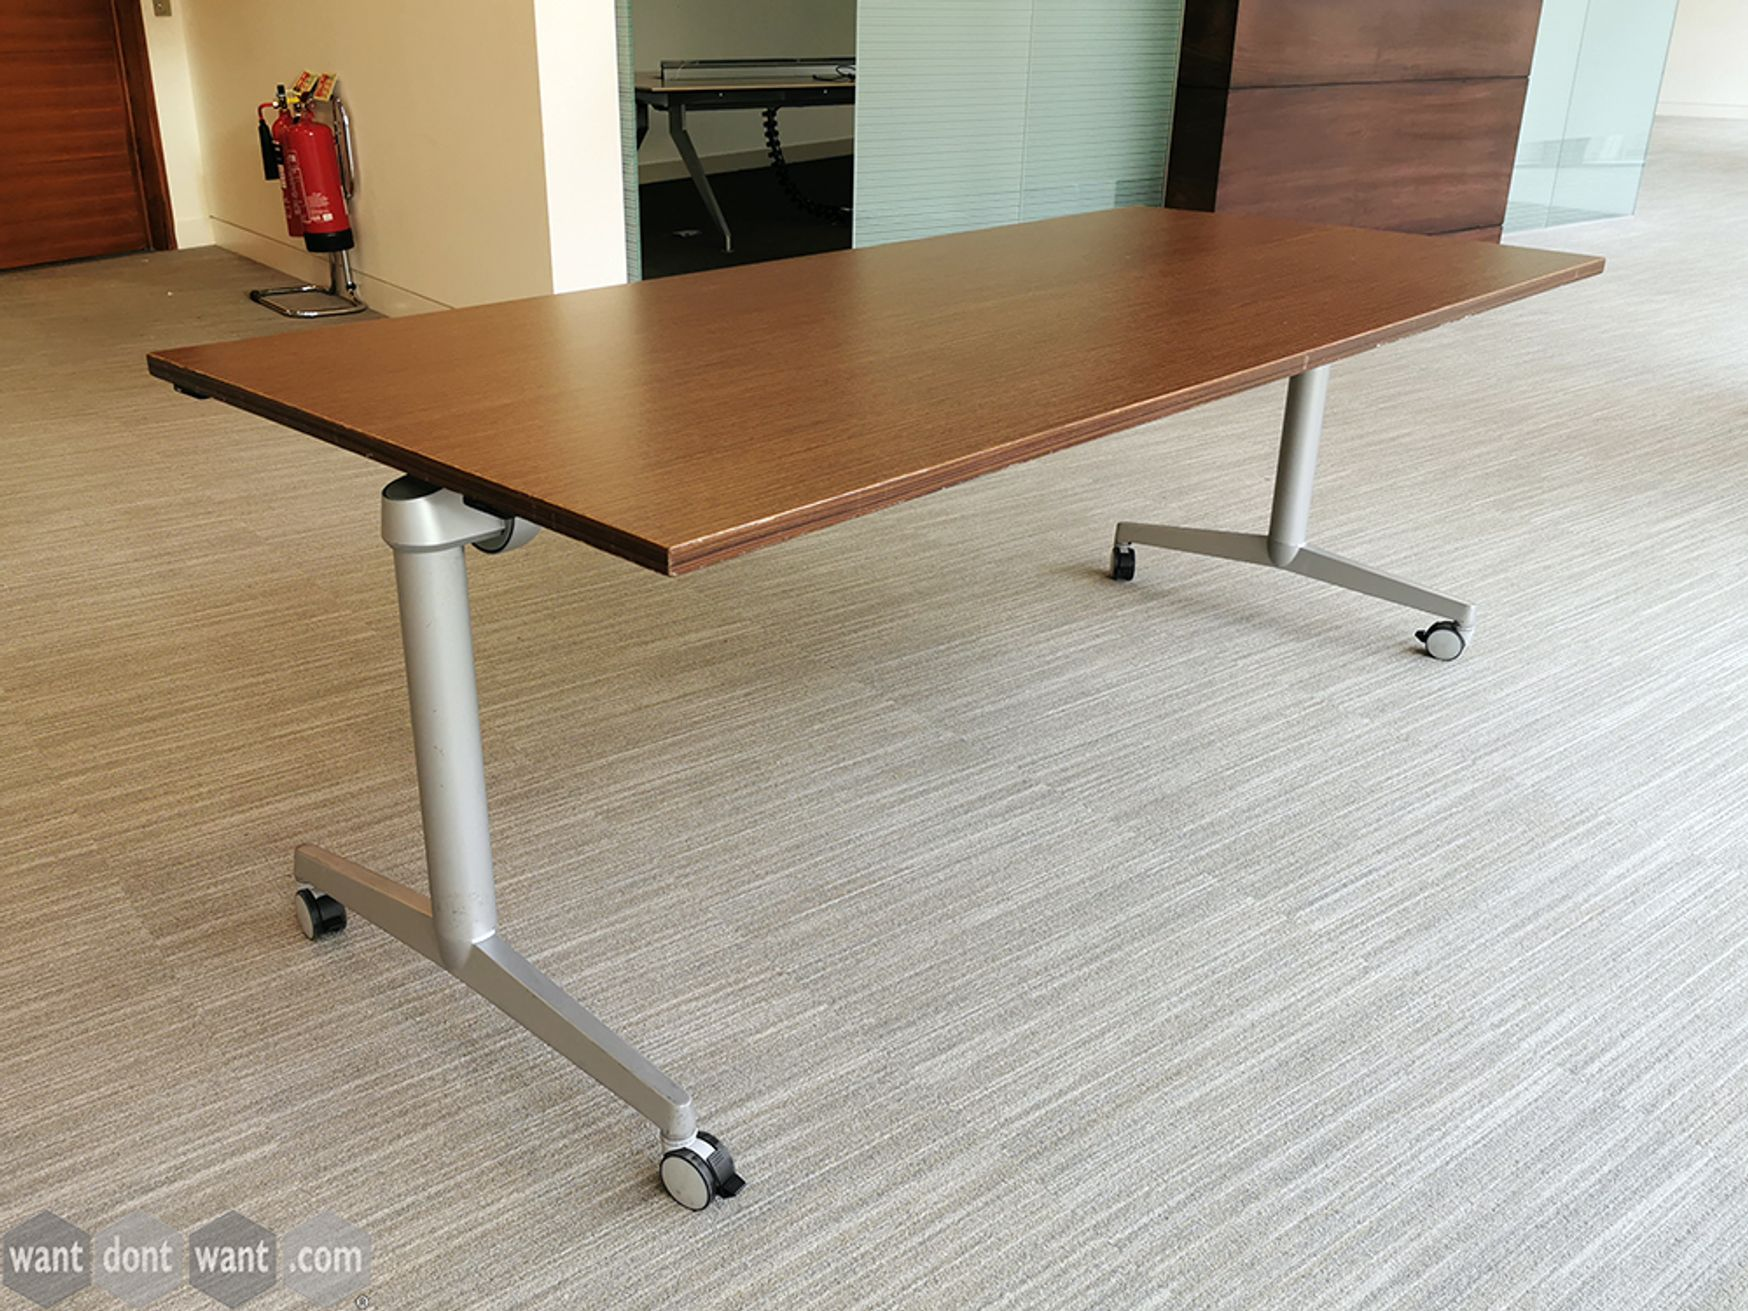 Used Steelcase Flip Top Twin Rectangular Meeting Table on Wheels in Walnut